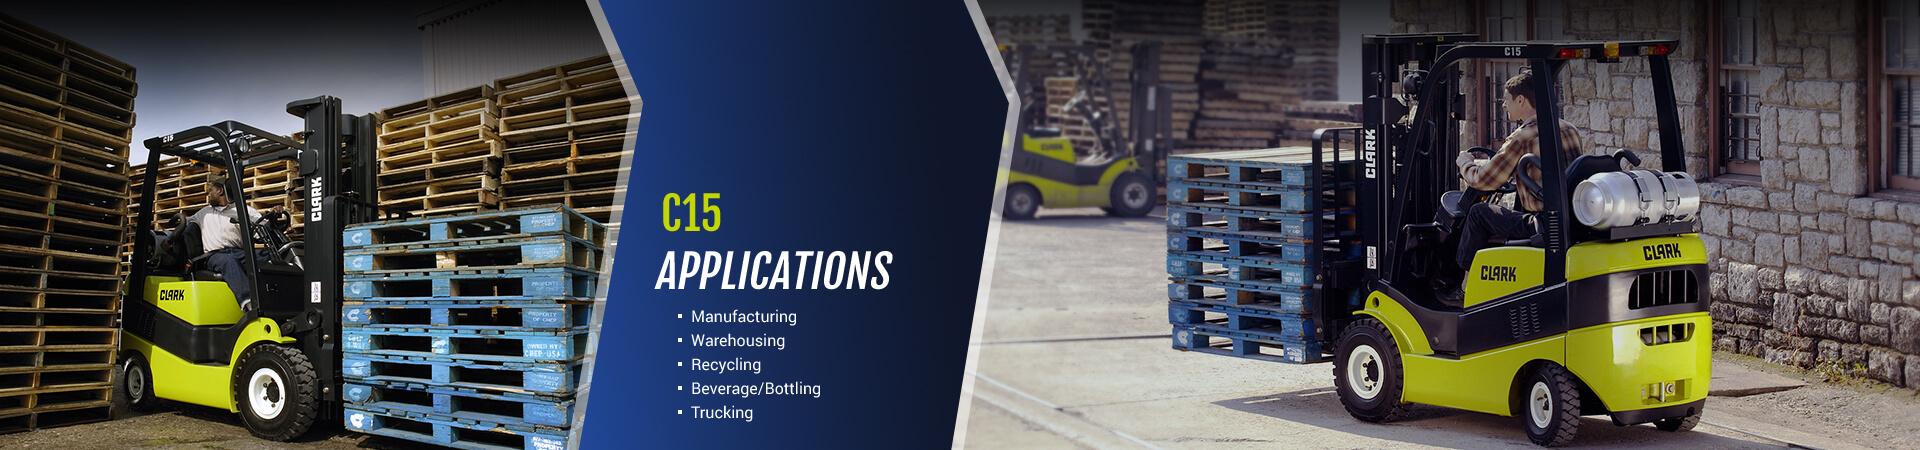 Clark Material Handling Company Forklifts Electric Forklift Wiring Diagram Bg